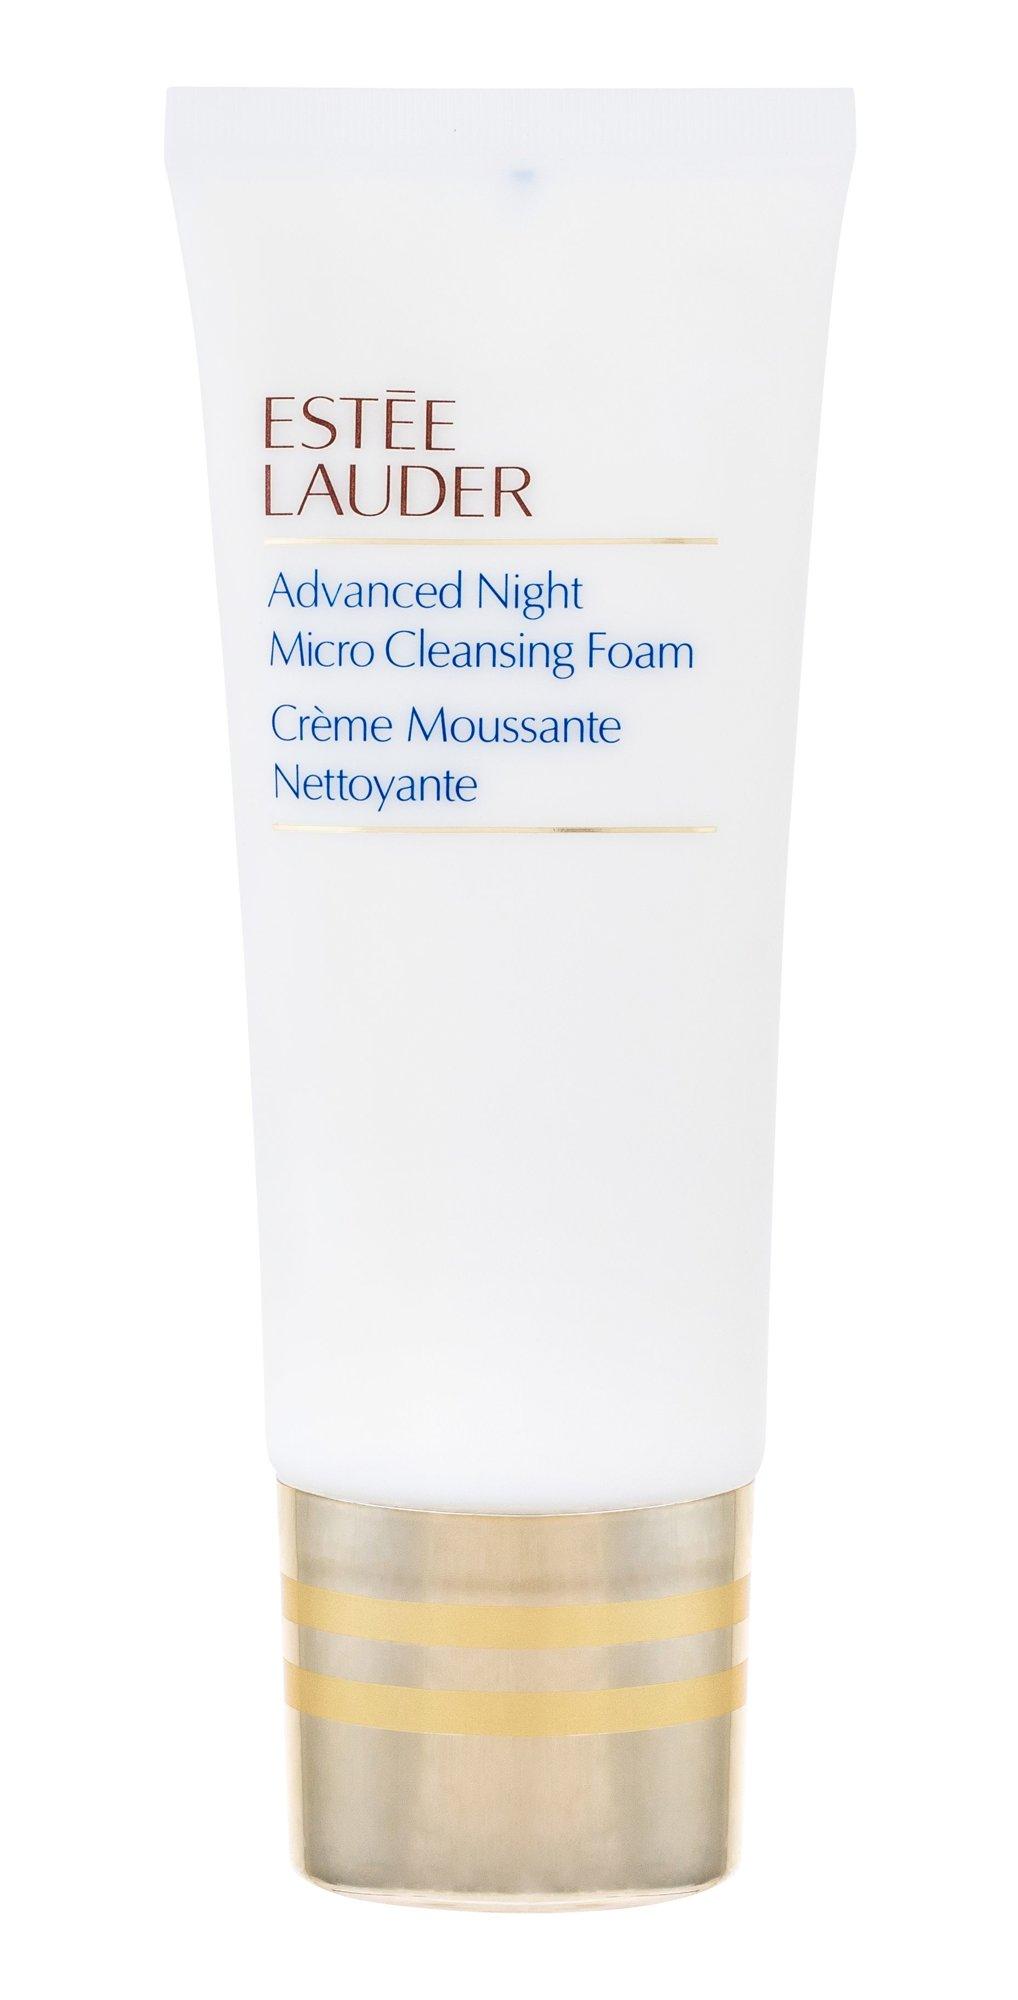 Estée Lauder Advanced Night Cosmetic 100ml